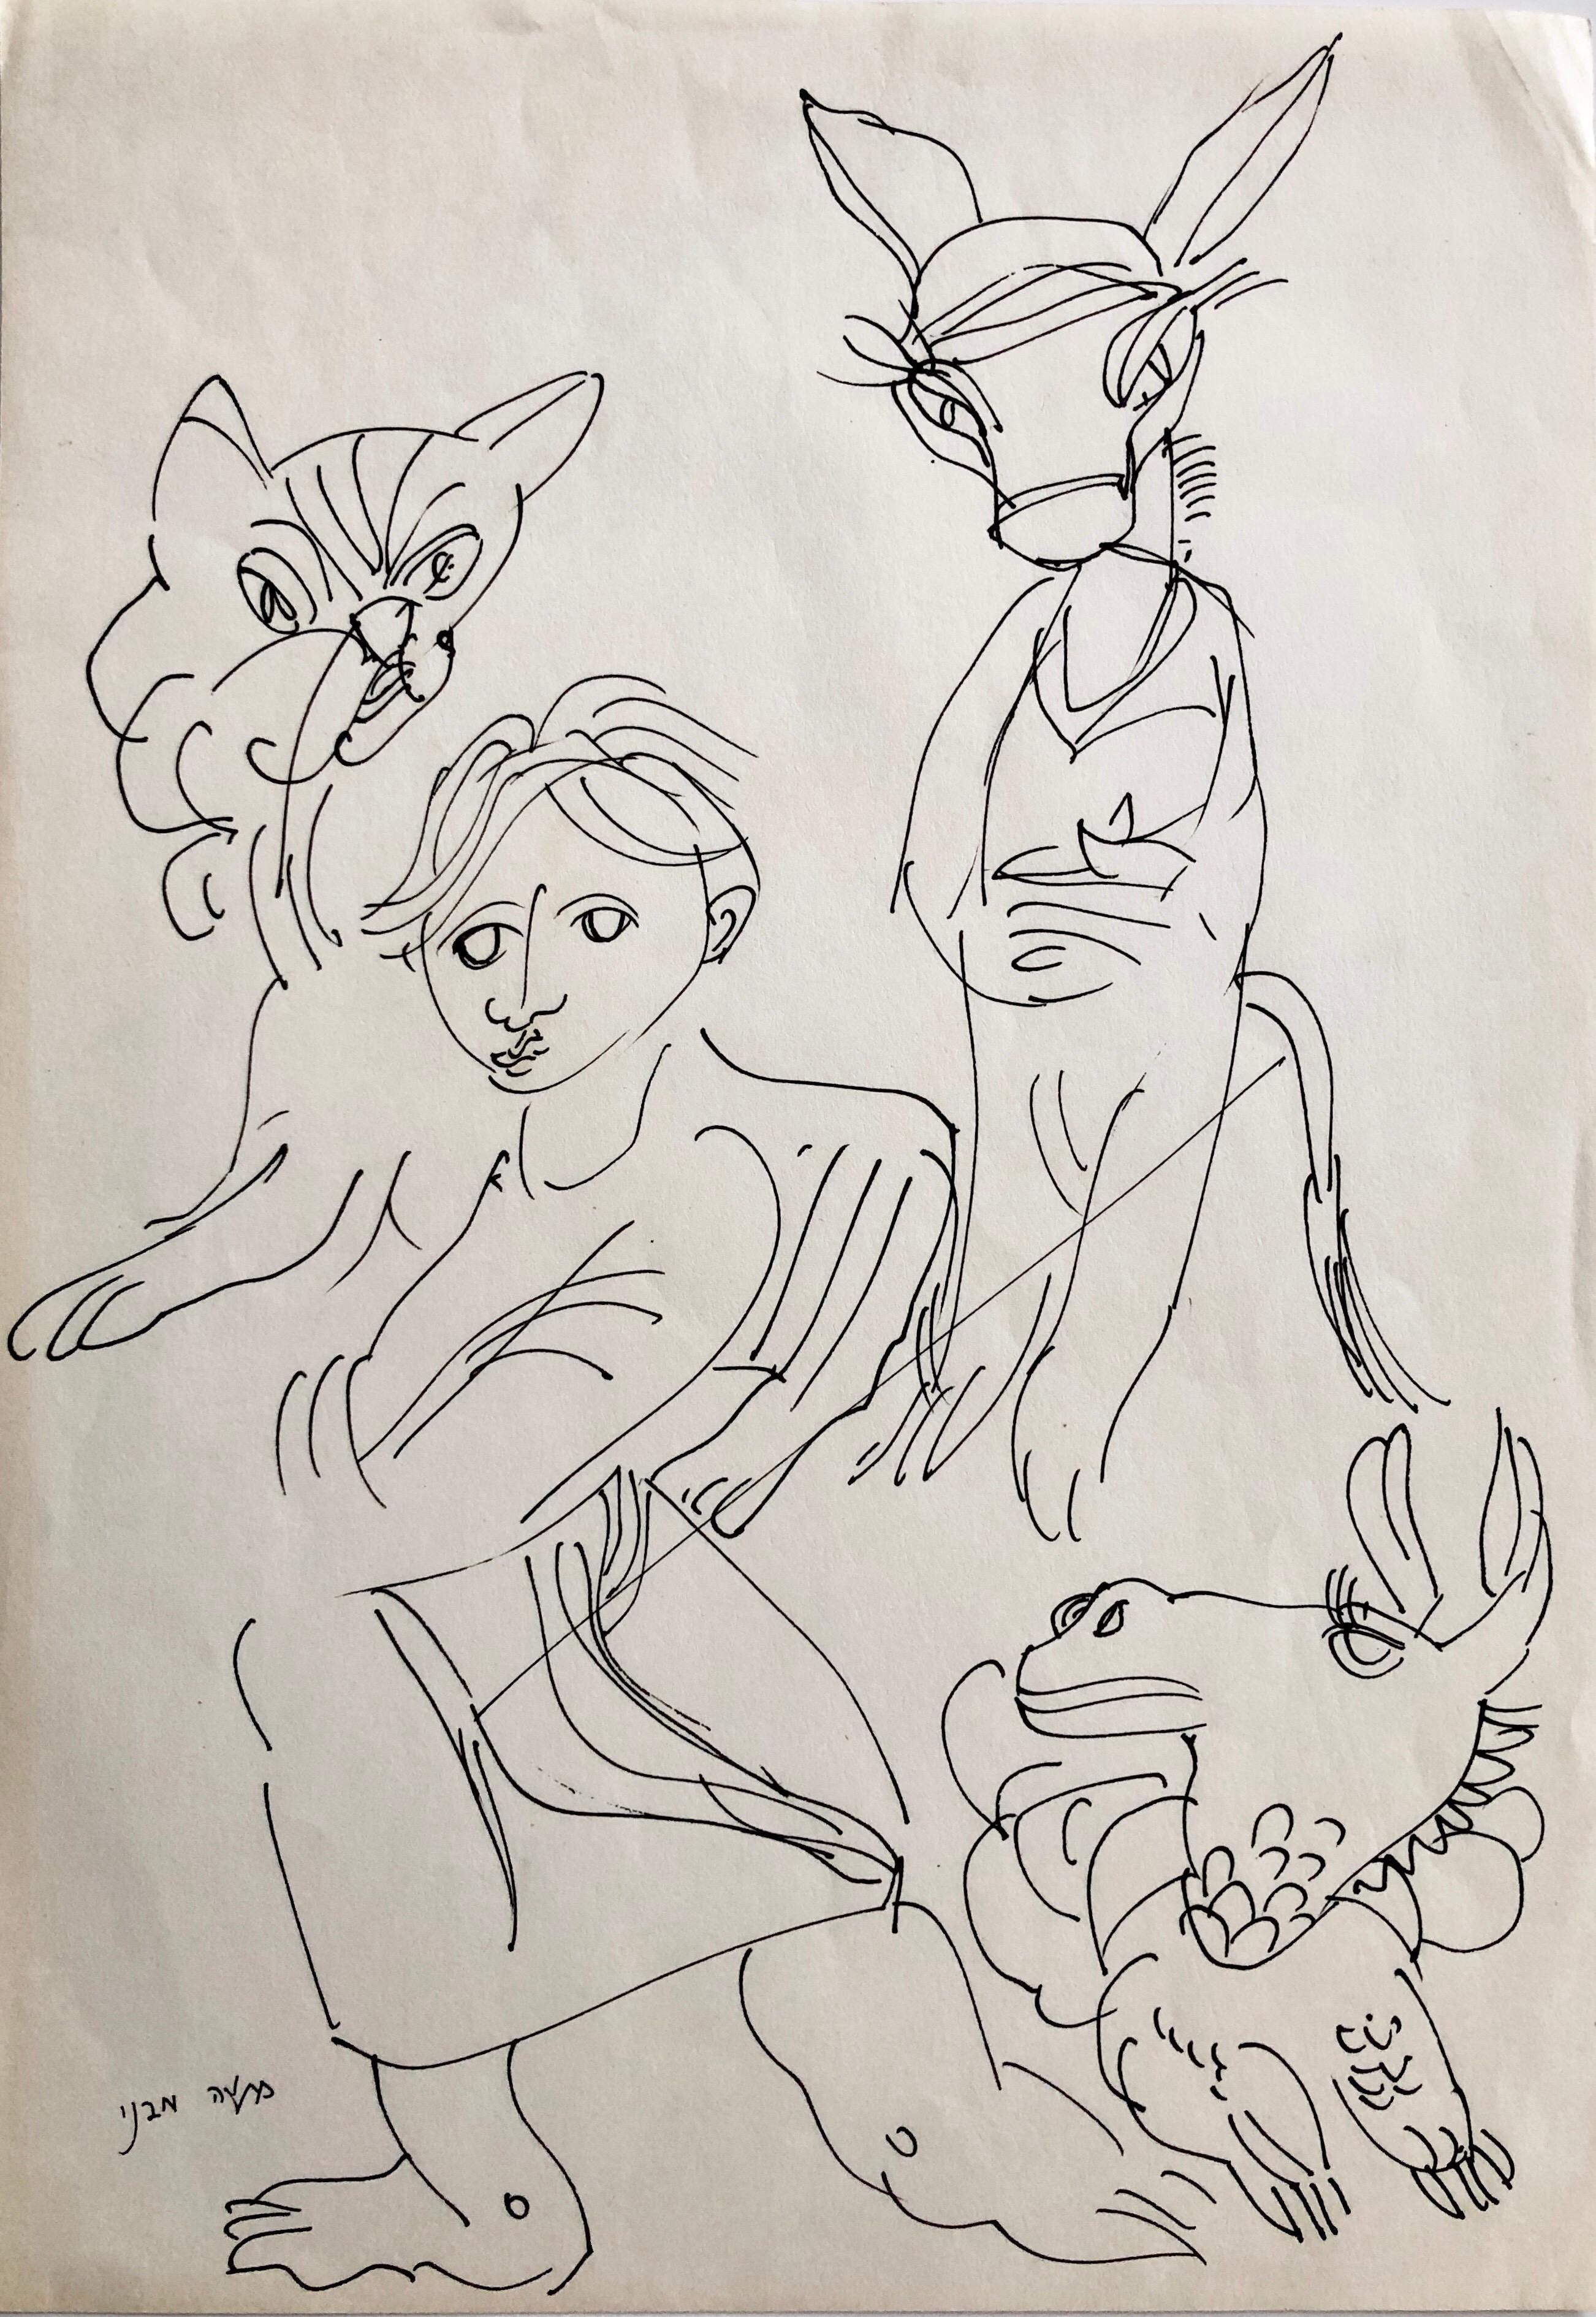 Vintage Israeli Bezalel School Drawing Surrealist Boy with Animals Kibbutz Life